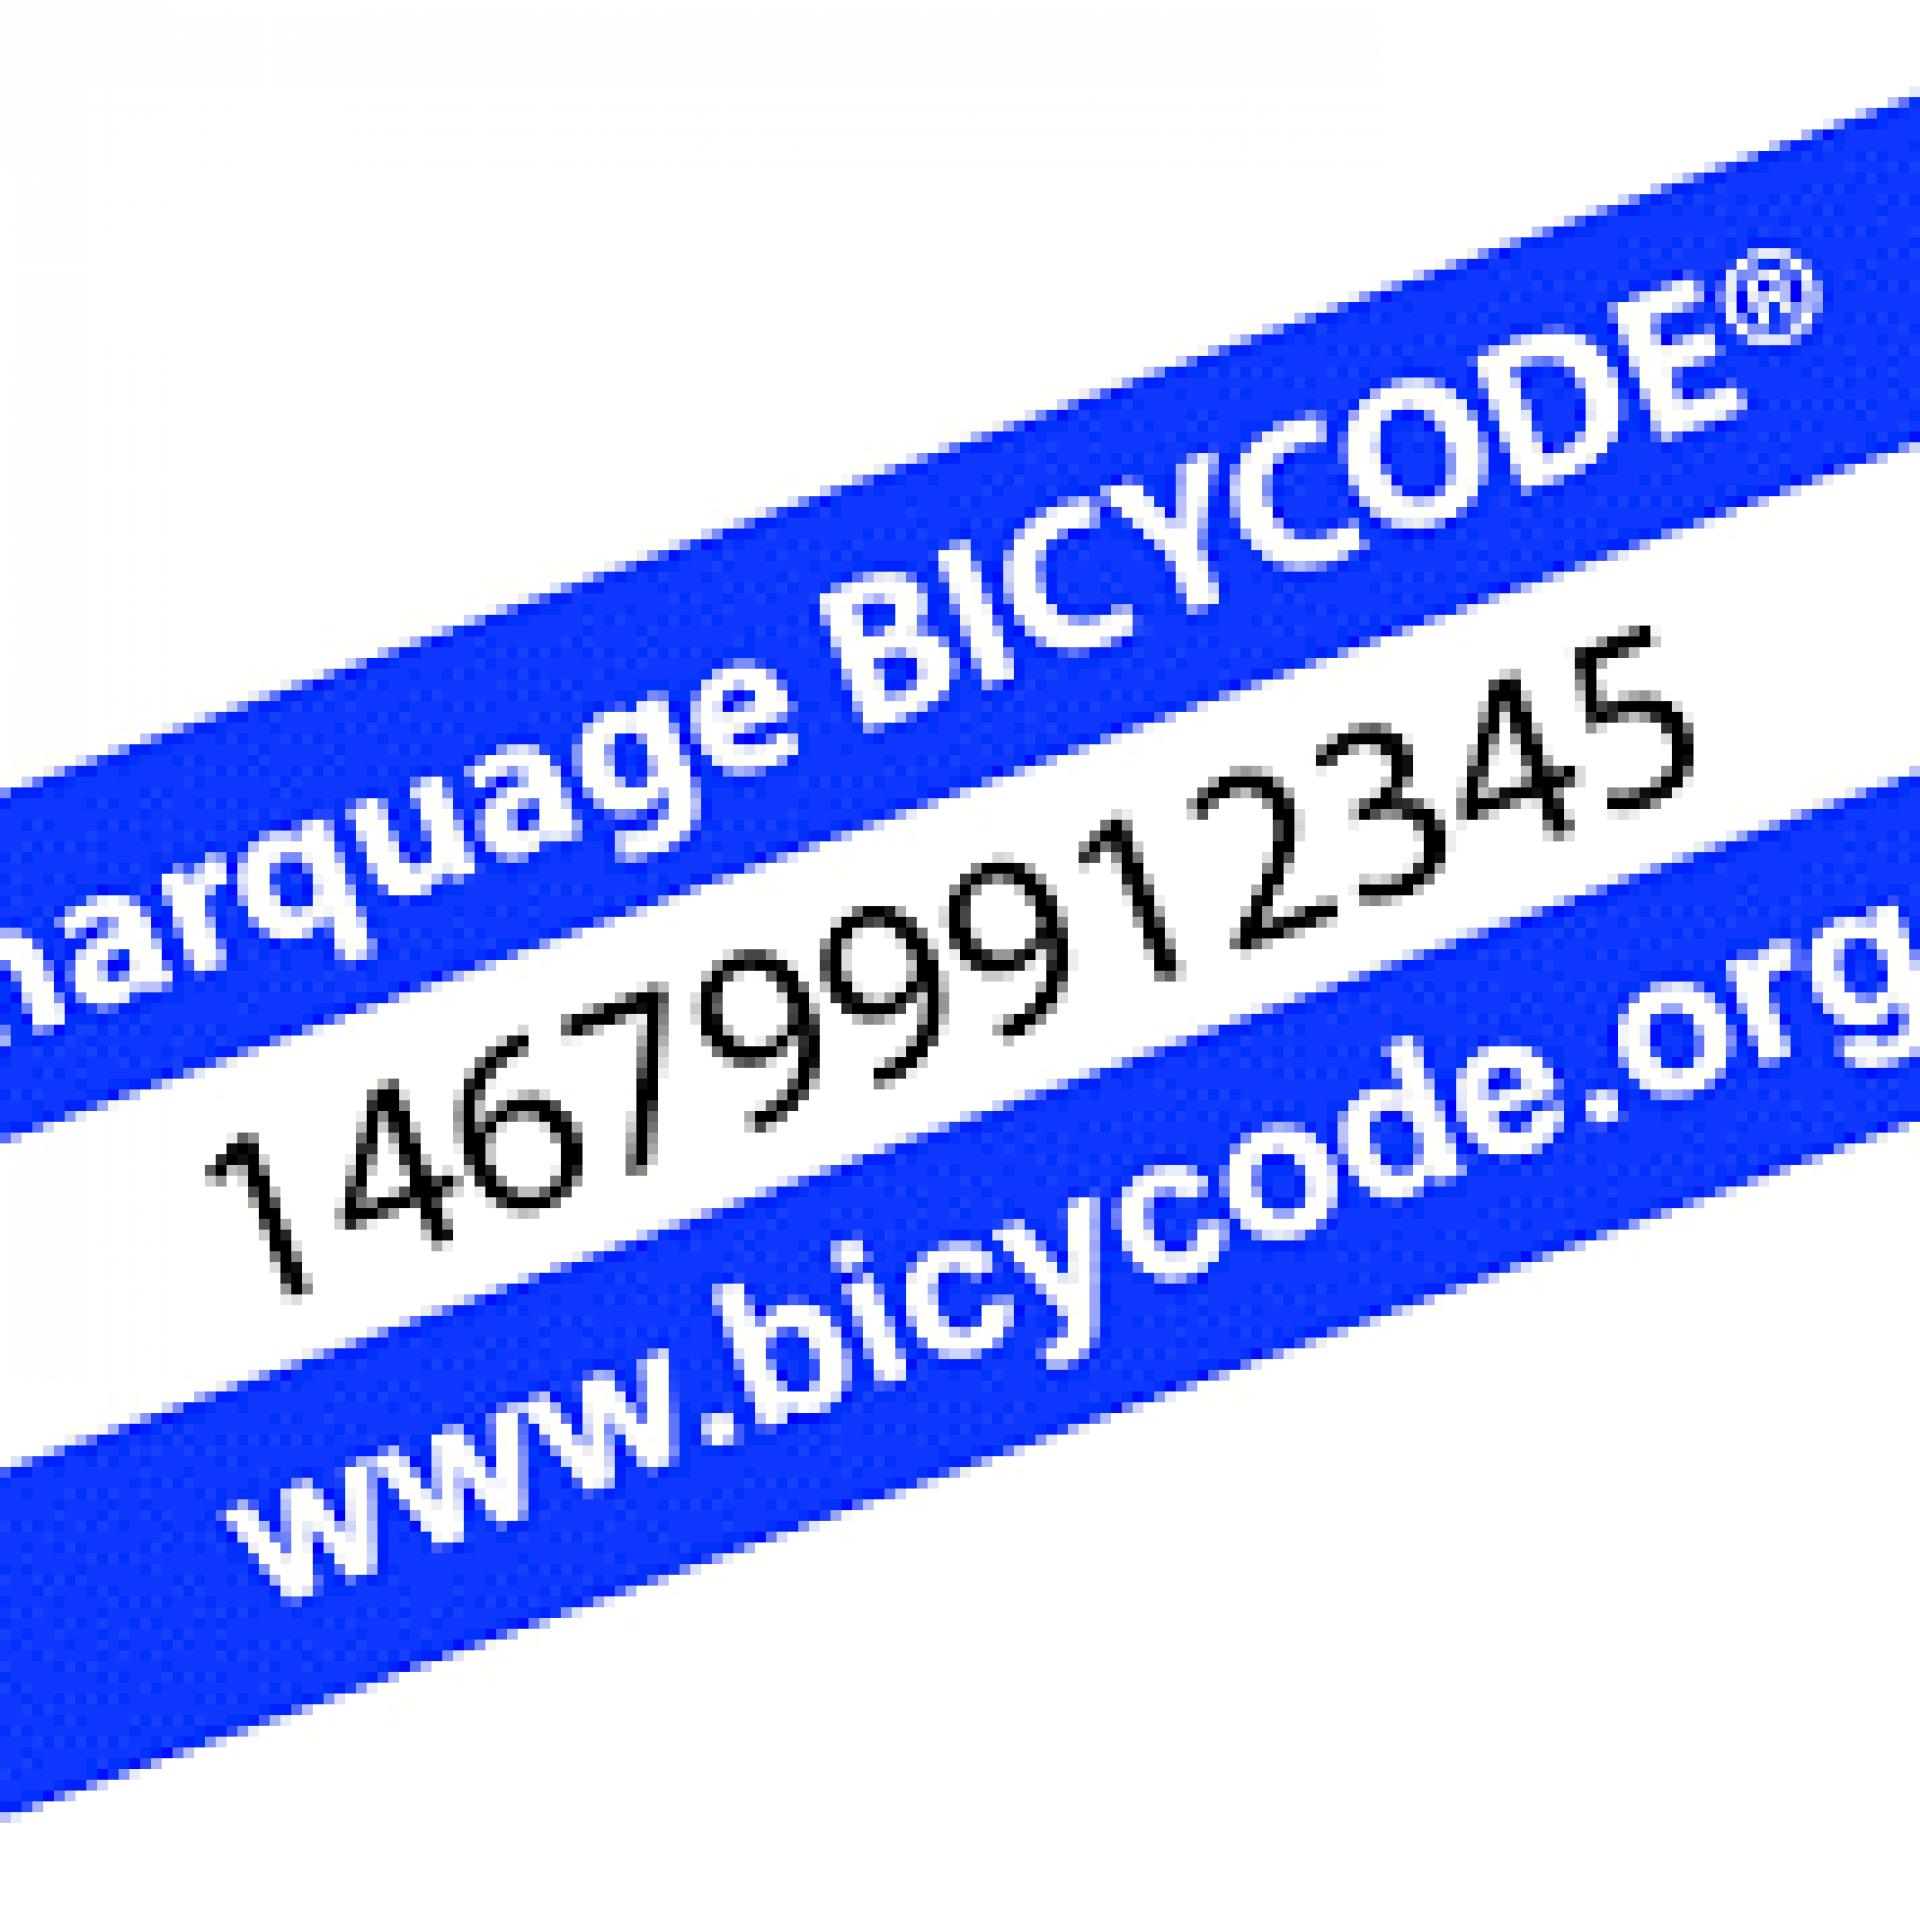 marquebycicode.jpg